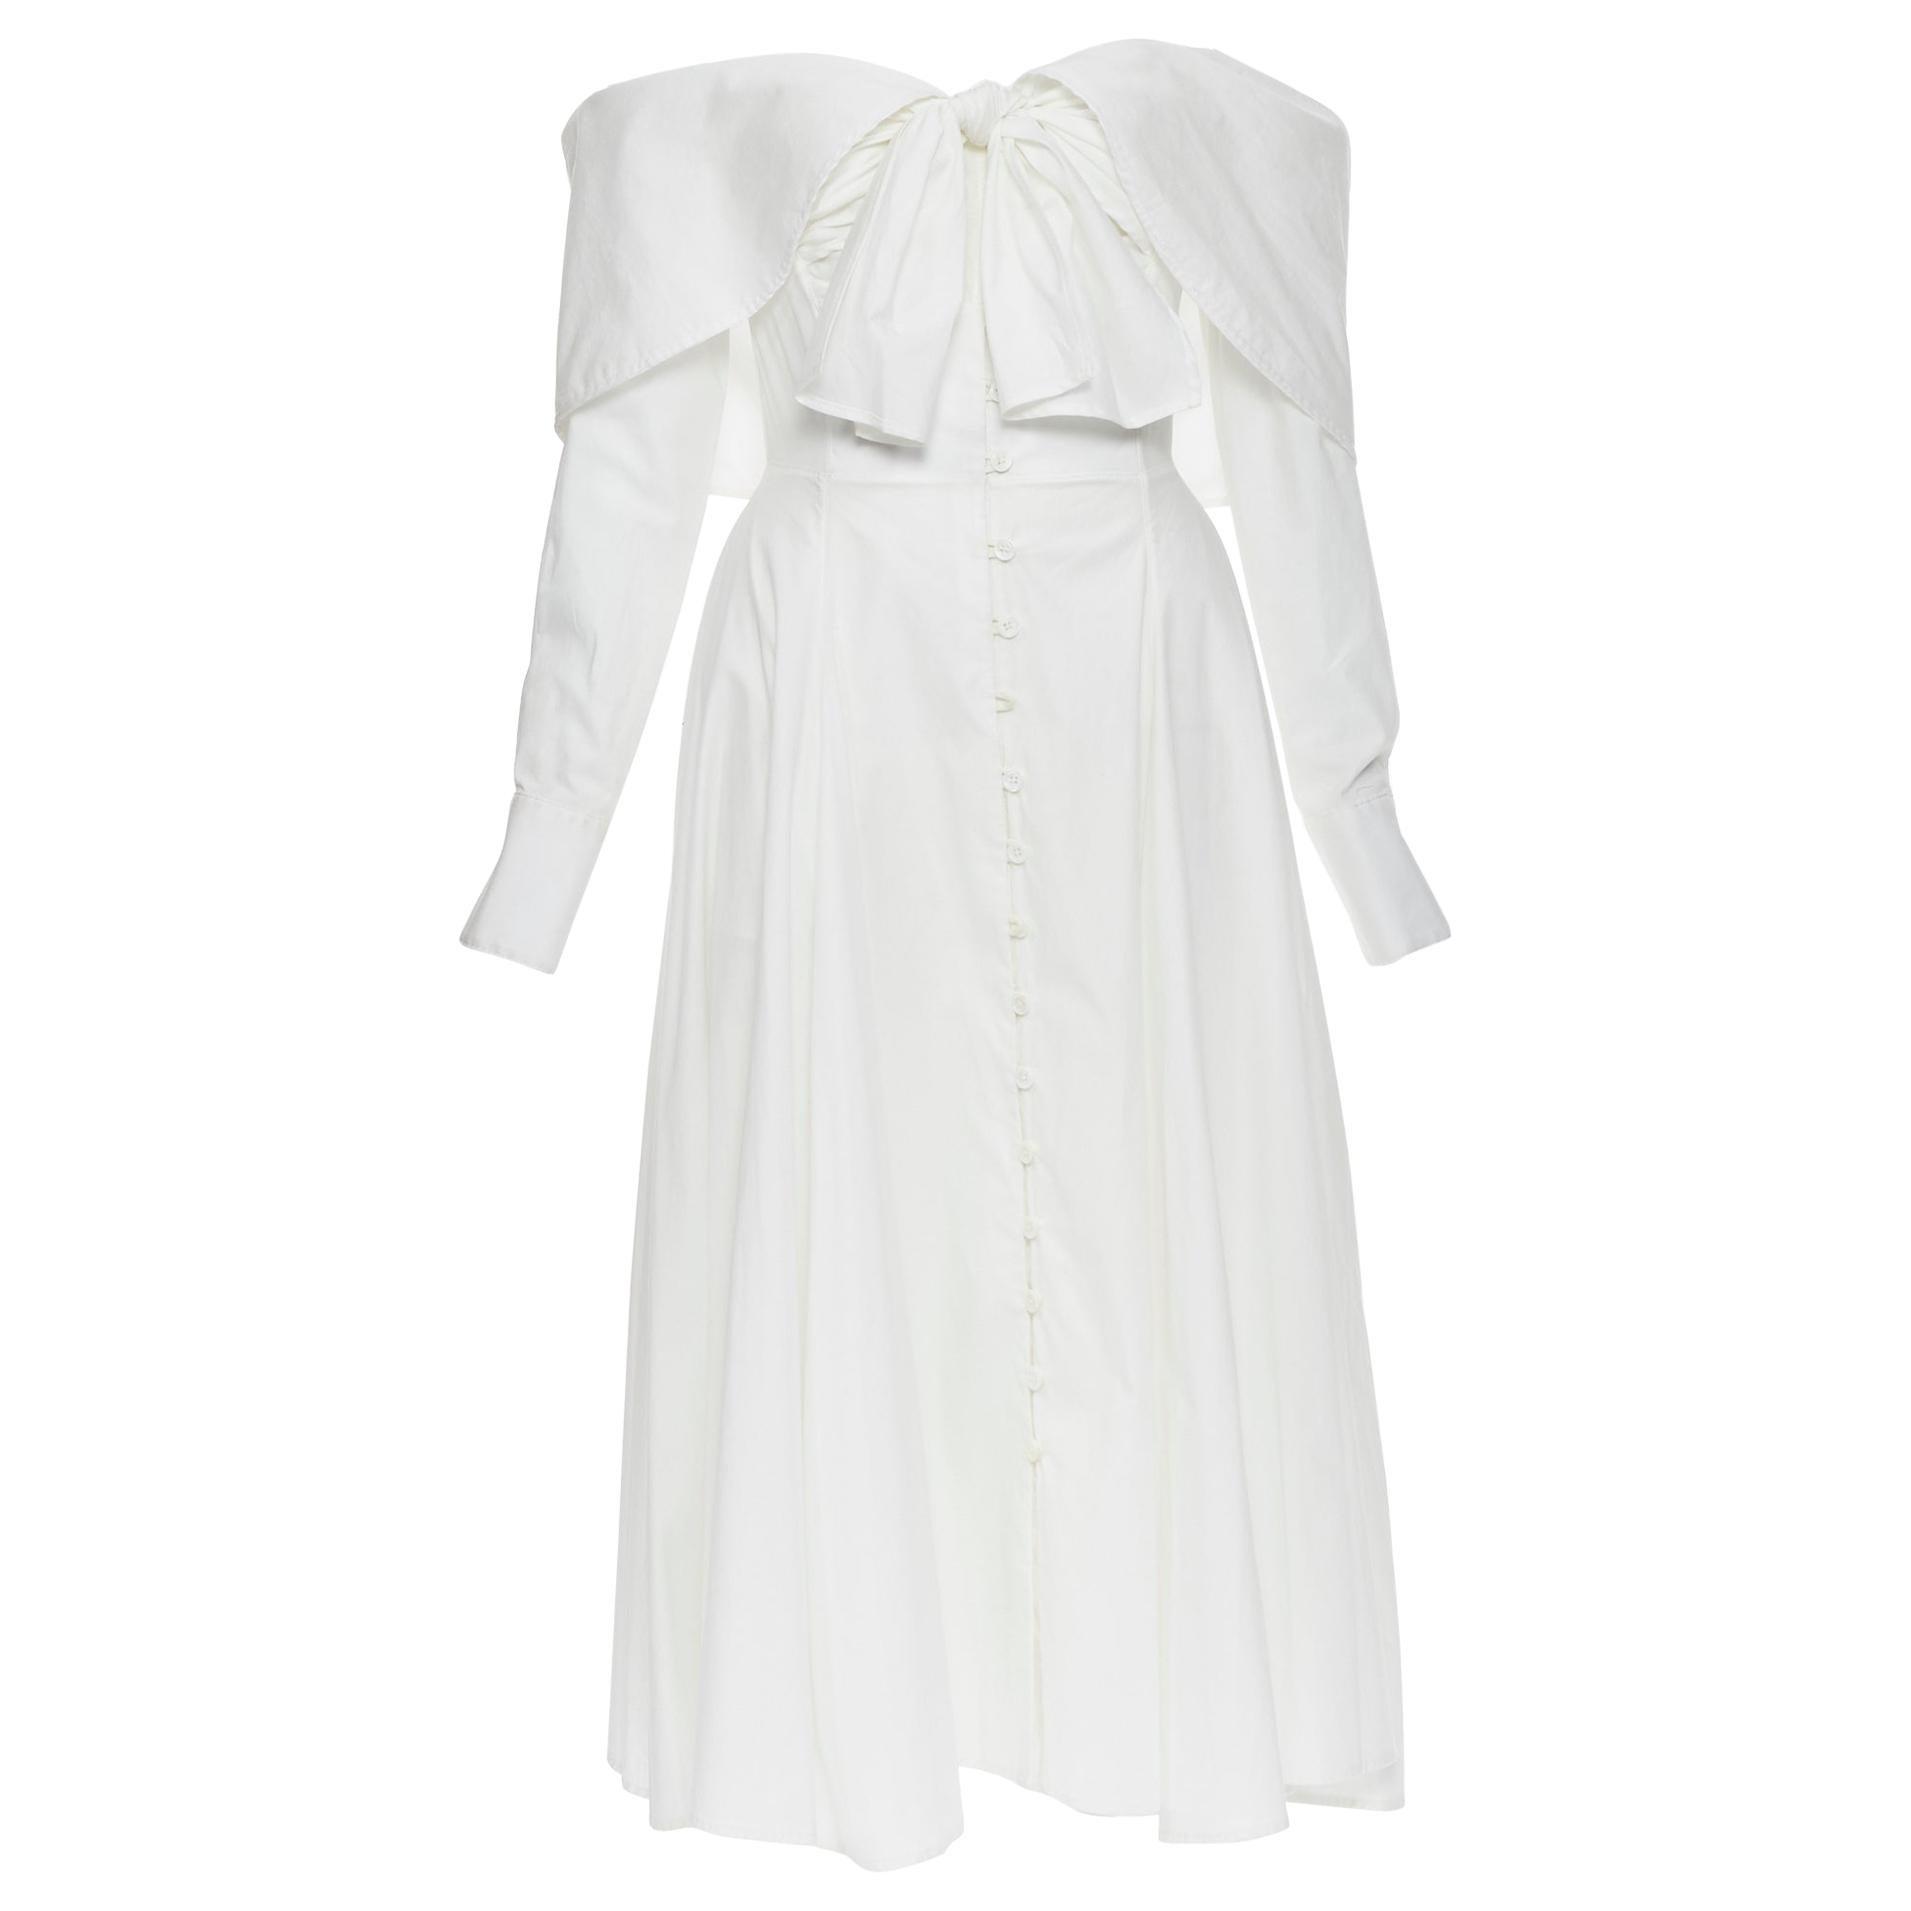 new ROSIE ASSOULIN Booby Trap white cotton poplin tie bust midi dress US2 XS